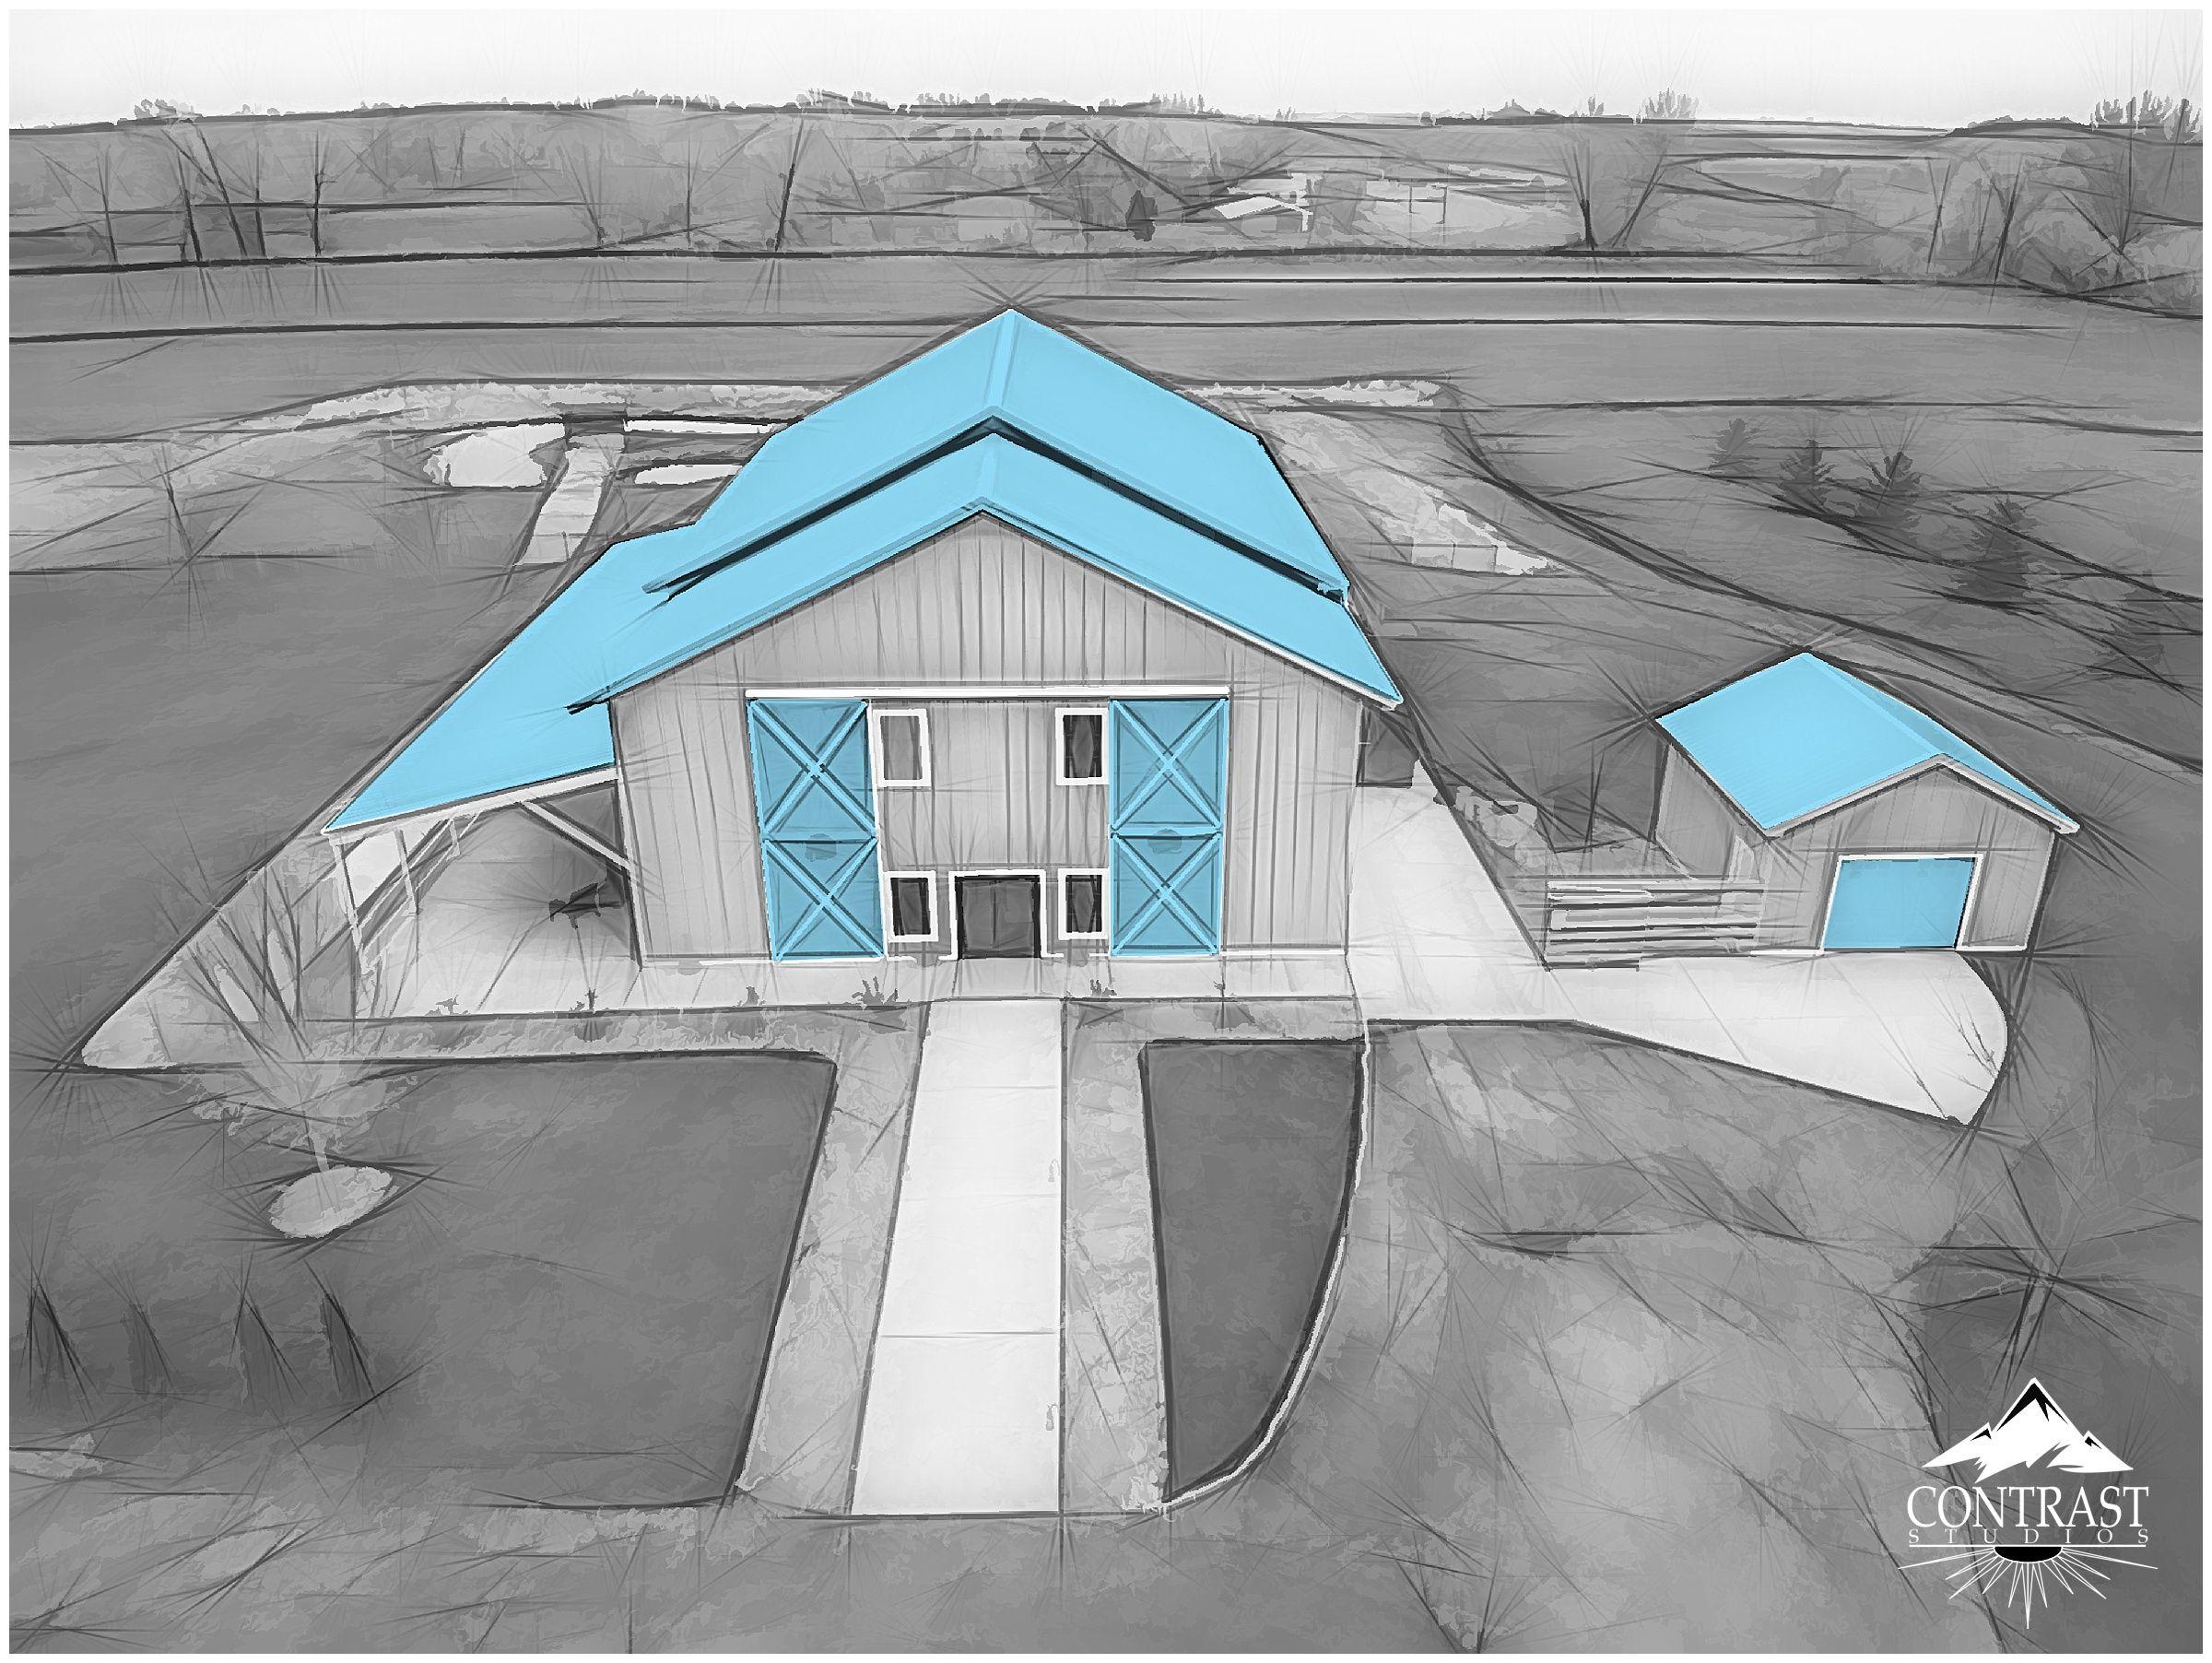 4579eaa26c0b159f14eb05bb3f9159f6 - Blue Haven Barn And Gardens Sioux Falls